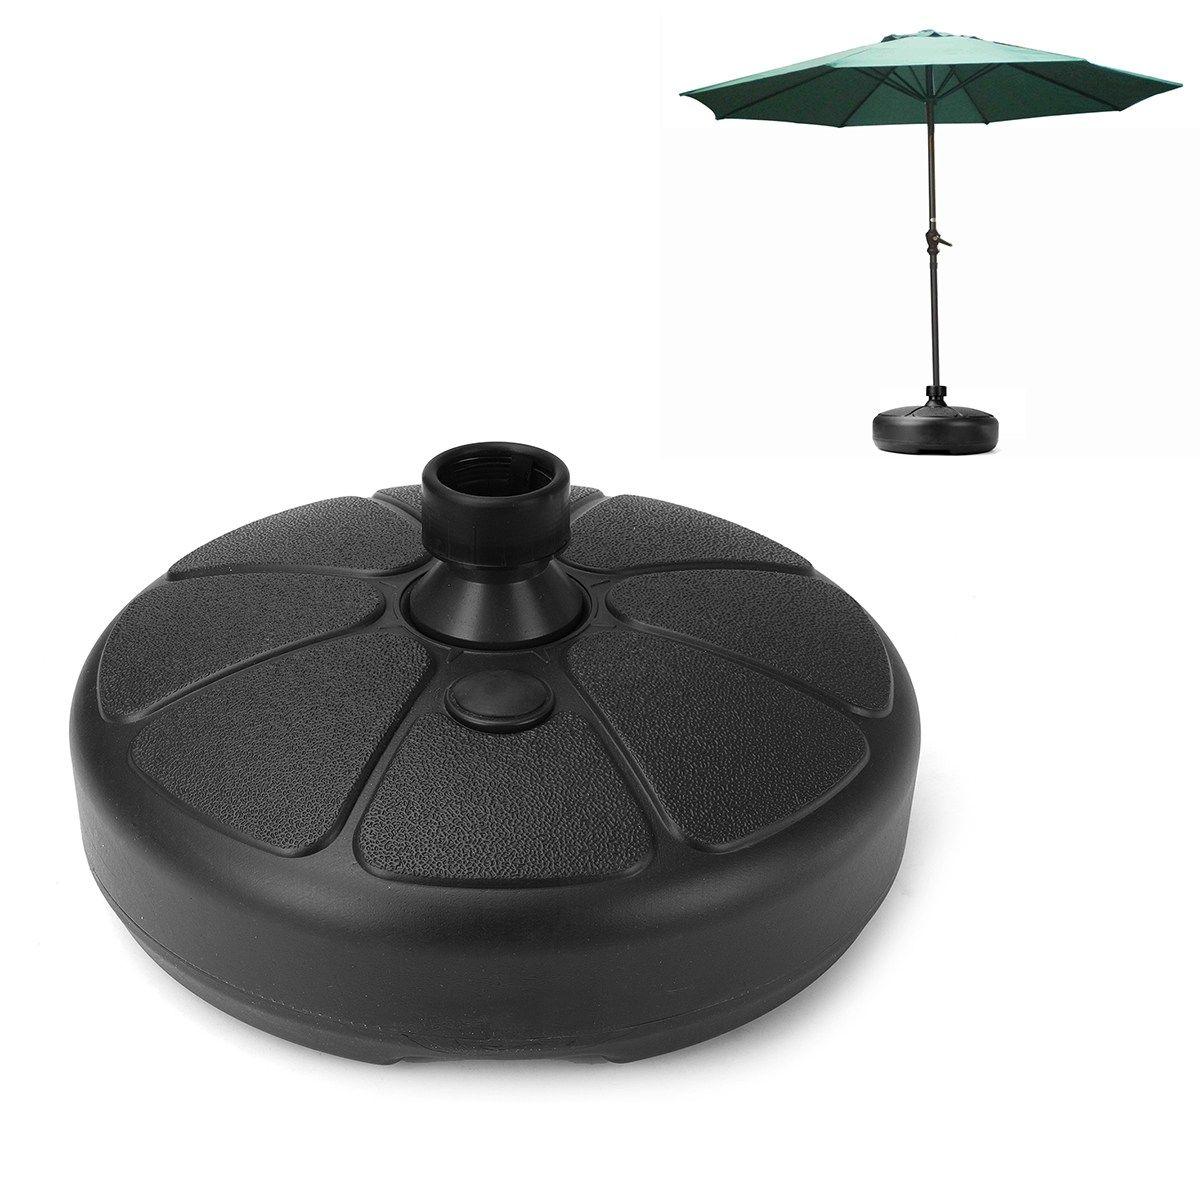 Durable Outdoor Parasol Garden Umbrella Base Stand Round Patio Umbrella Bases Foundation Billboard Holder Sun <font><b>Shelter</b></font> Accessory